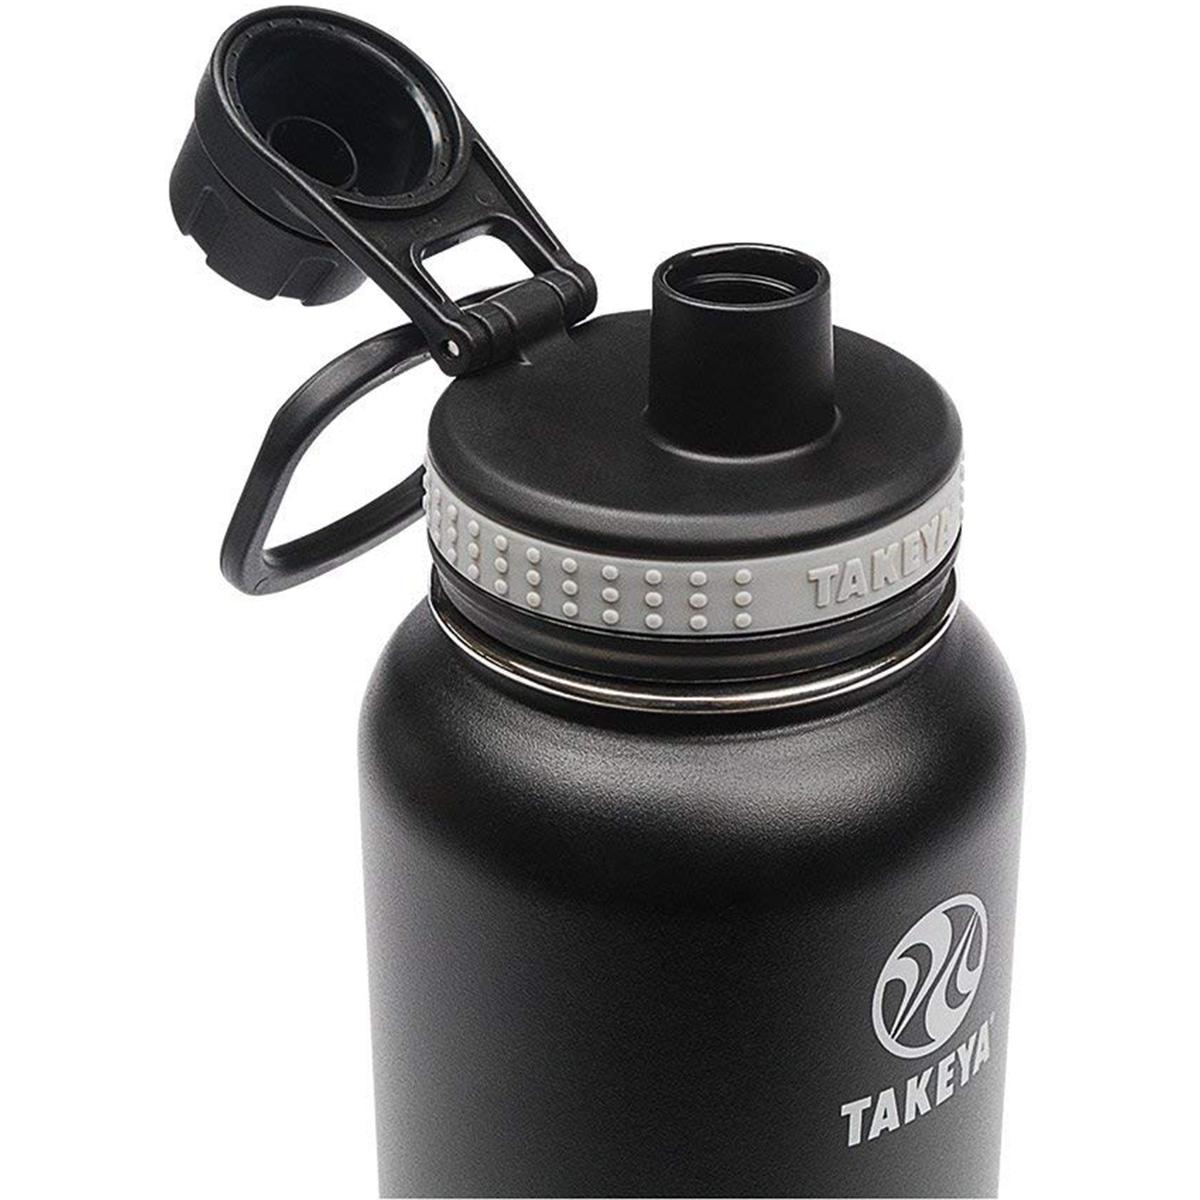 Takeya-Originals-32-oz-Insulated-Stainless-Steel-Water-Bottle thumbnail 3